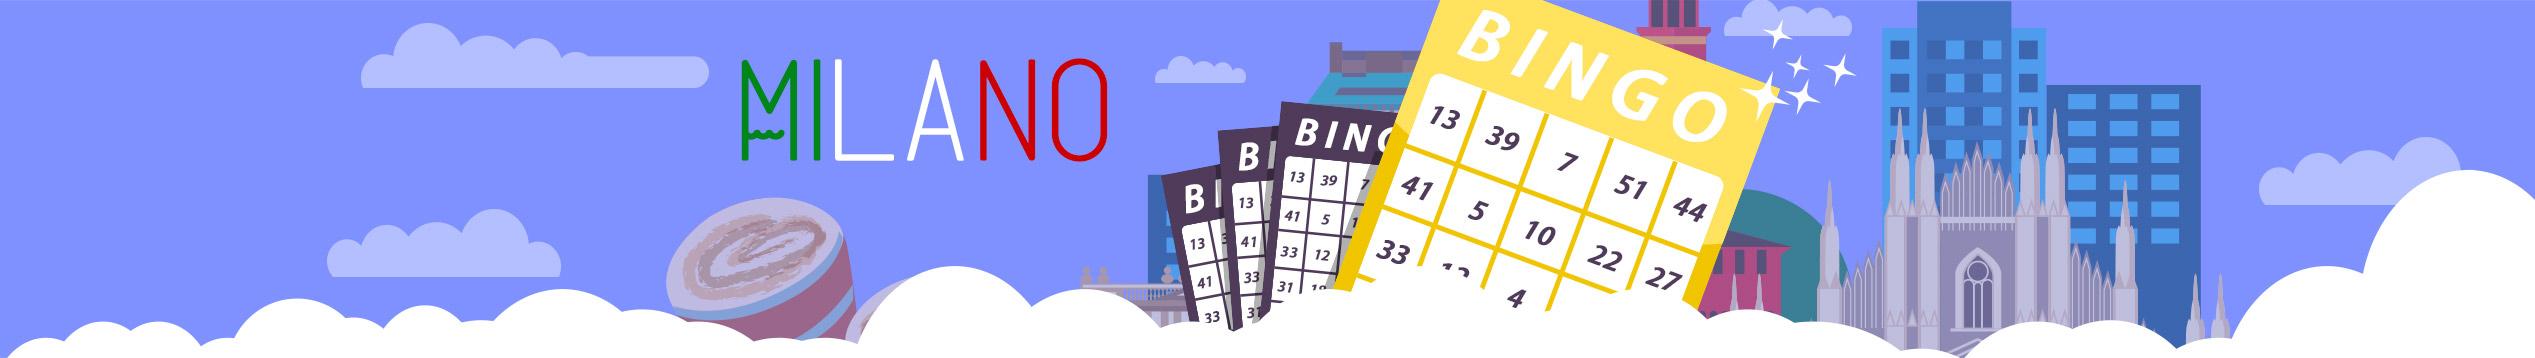 Samla gratisbrickor i bingohallen Milano denna vecka!